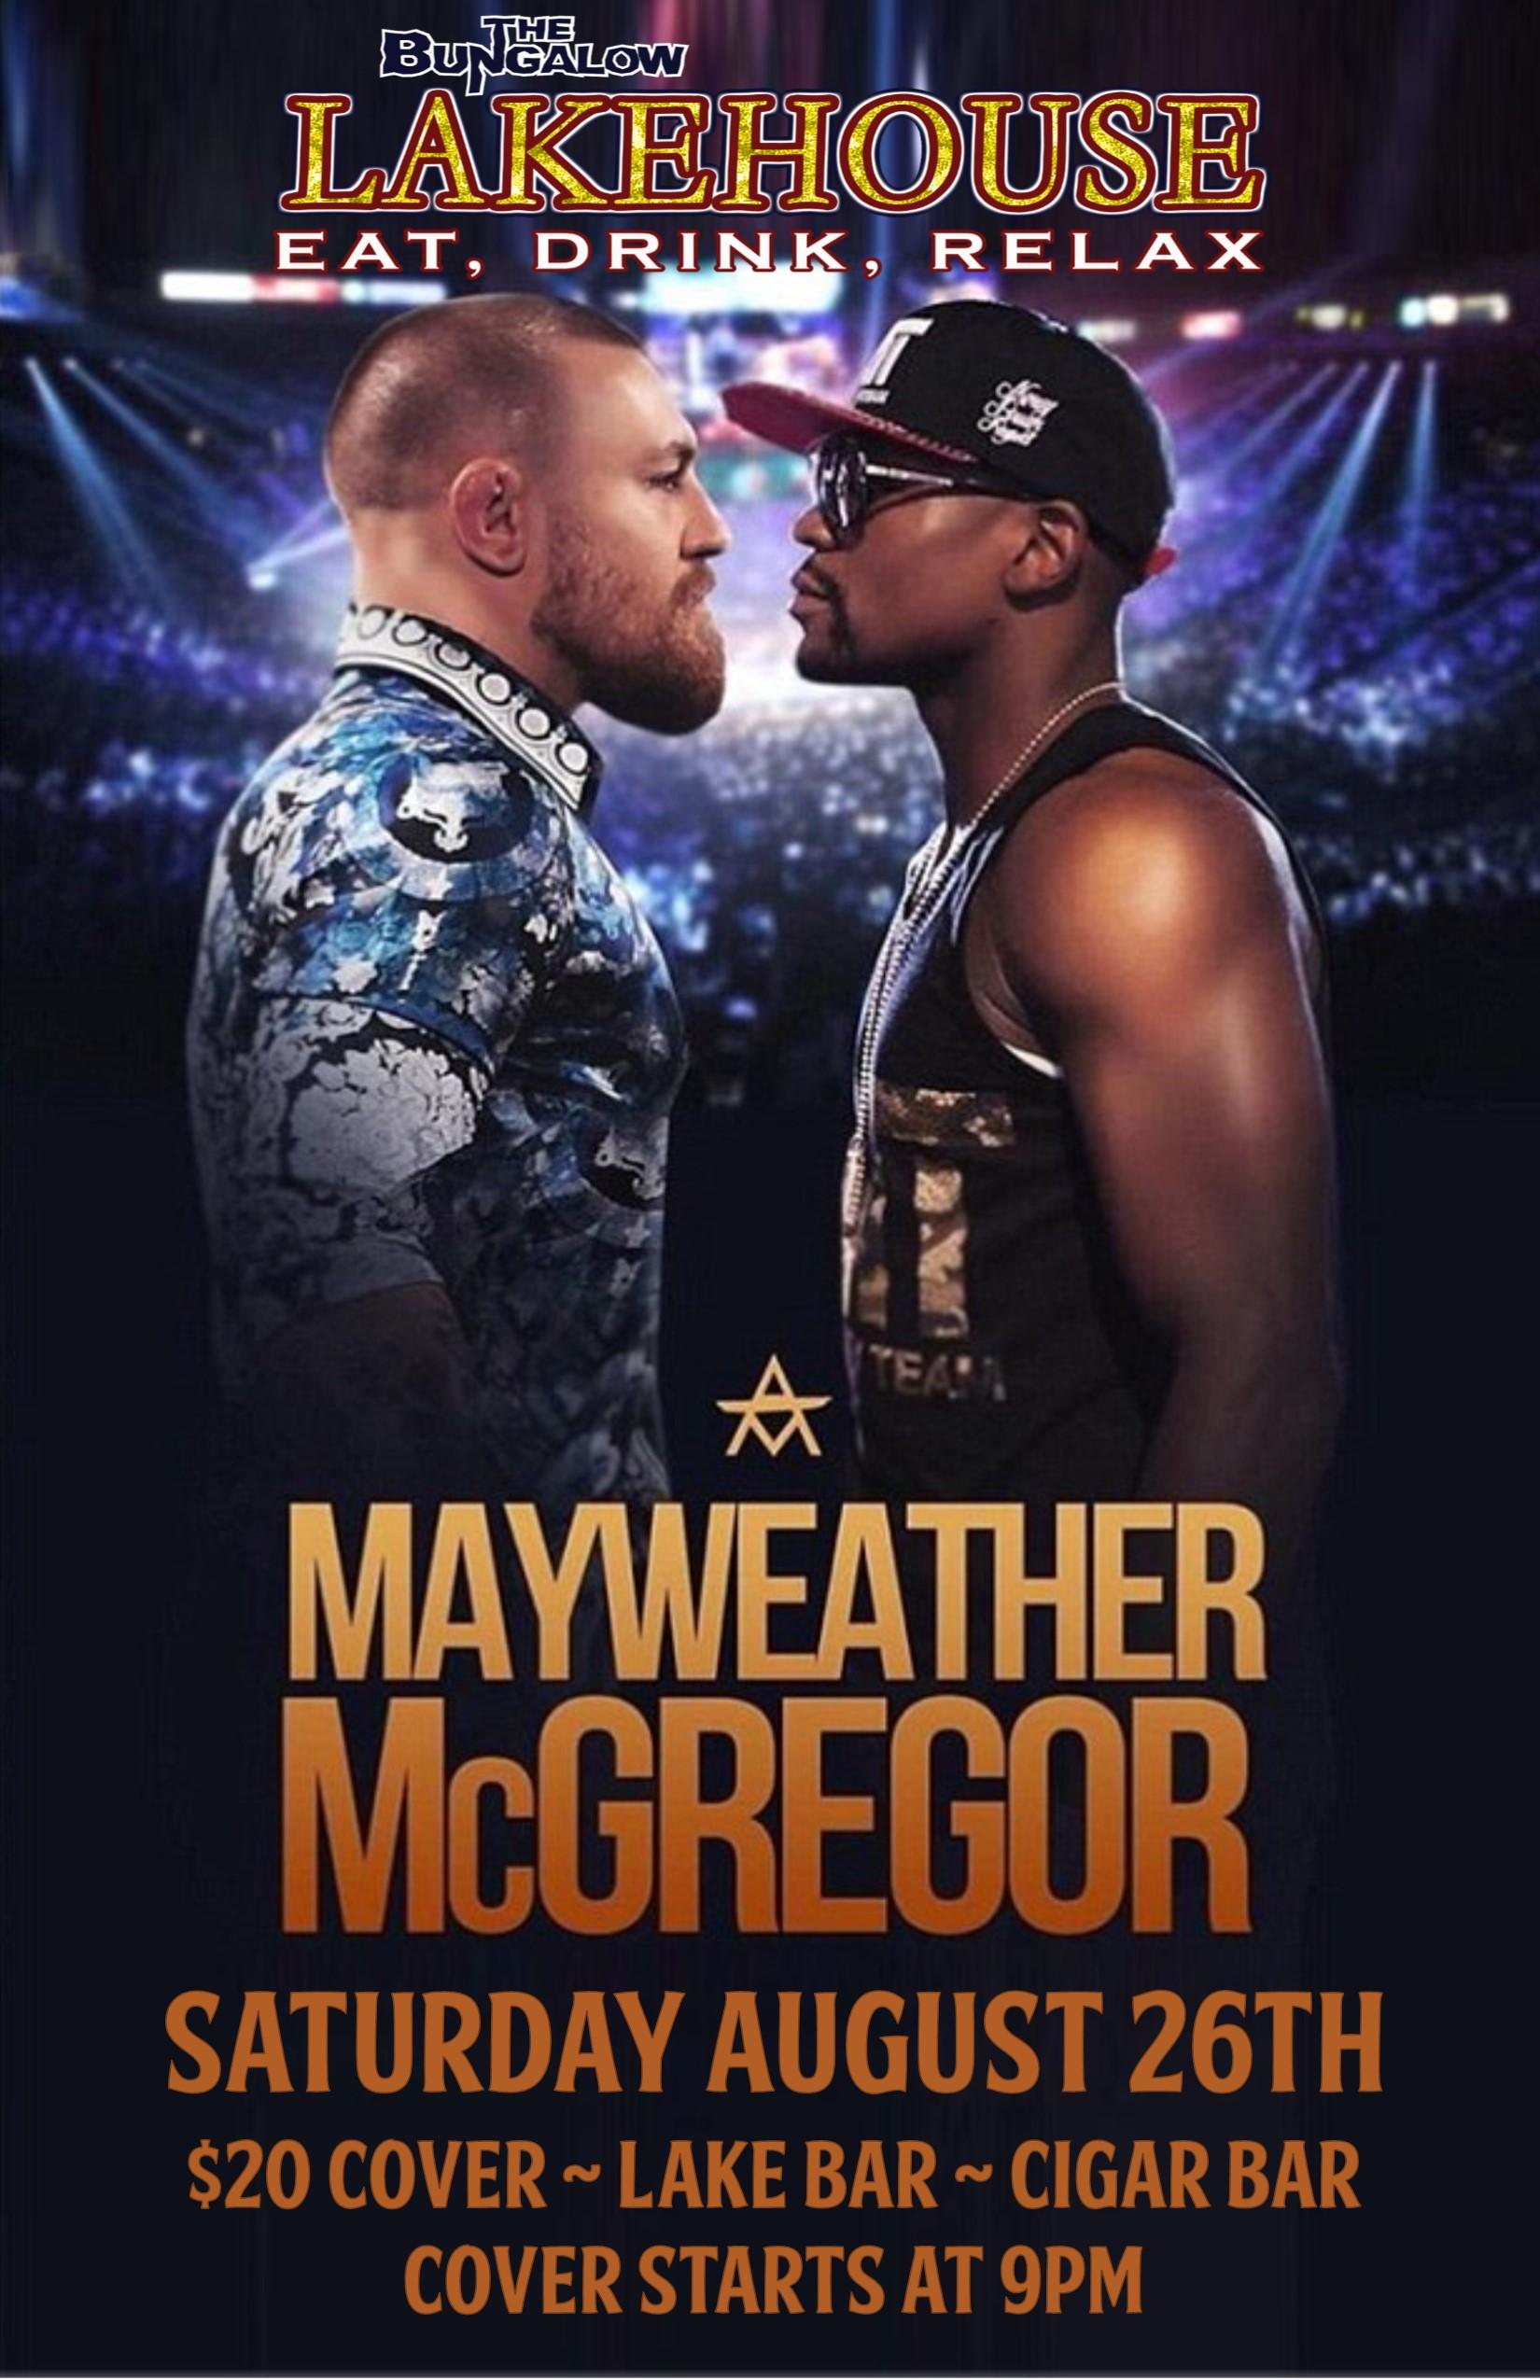 Mayweather McGregor LH